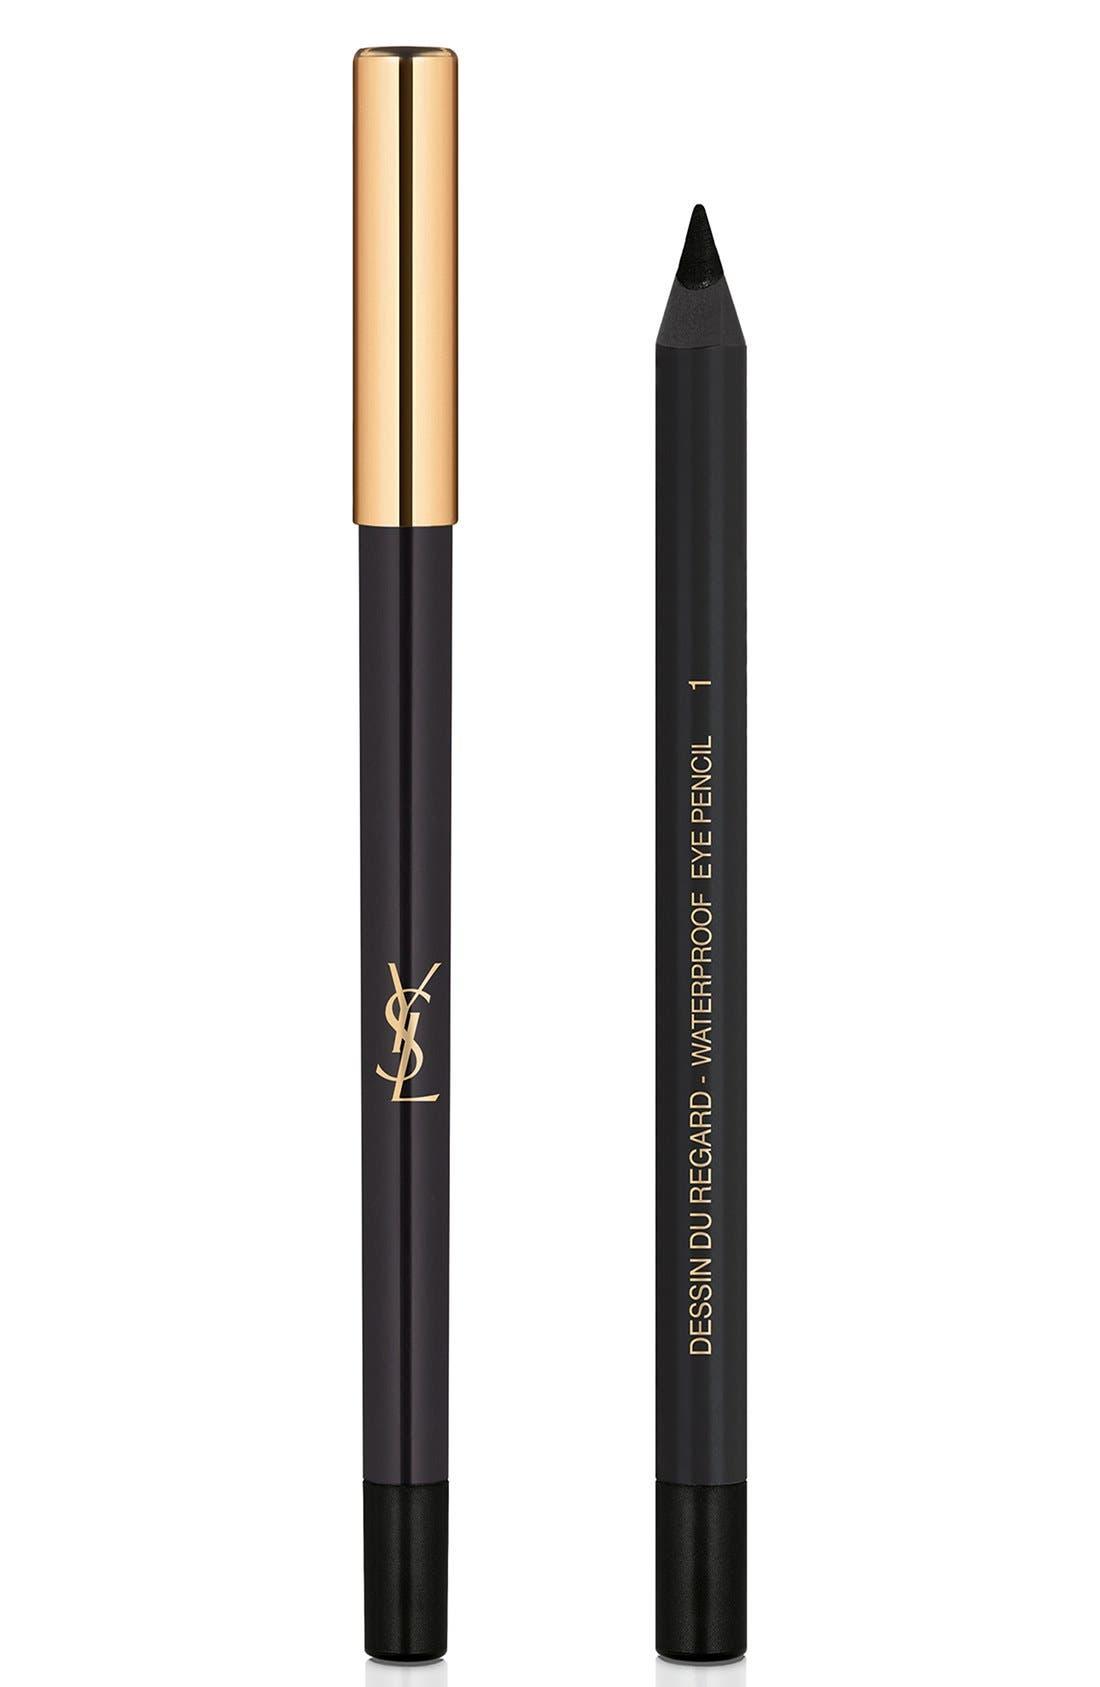 YVES SAINT LAURENT Dessin du Regard Waterproof Eyeliner Pencil, Main, color, 01 BLACK